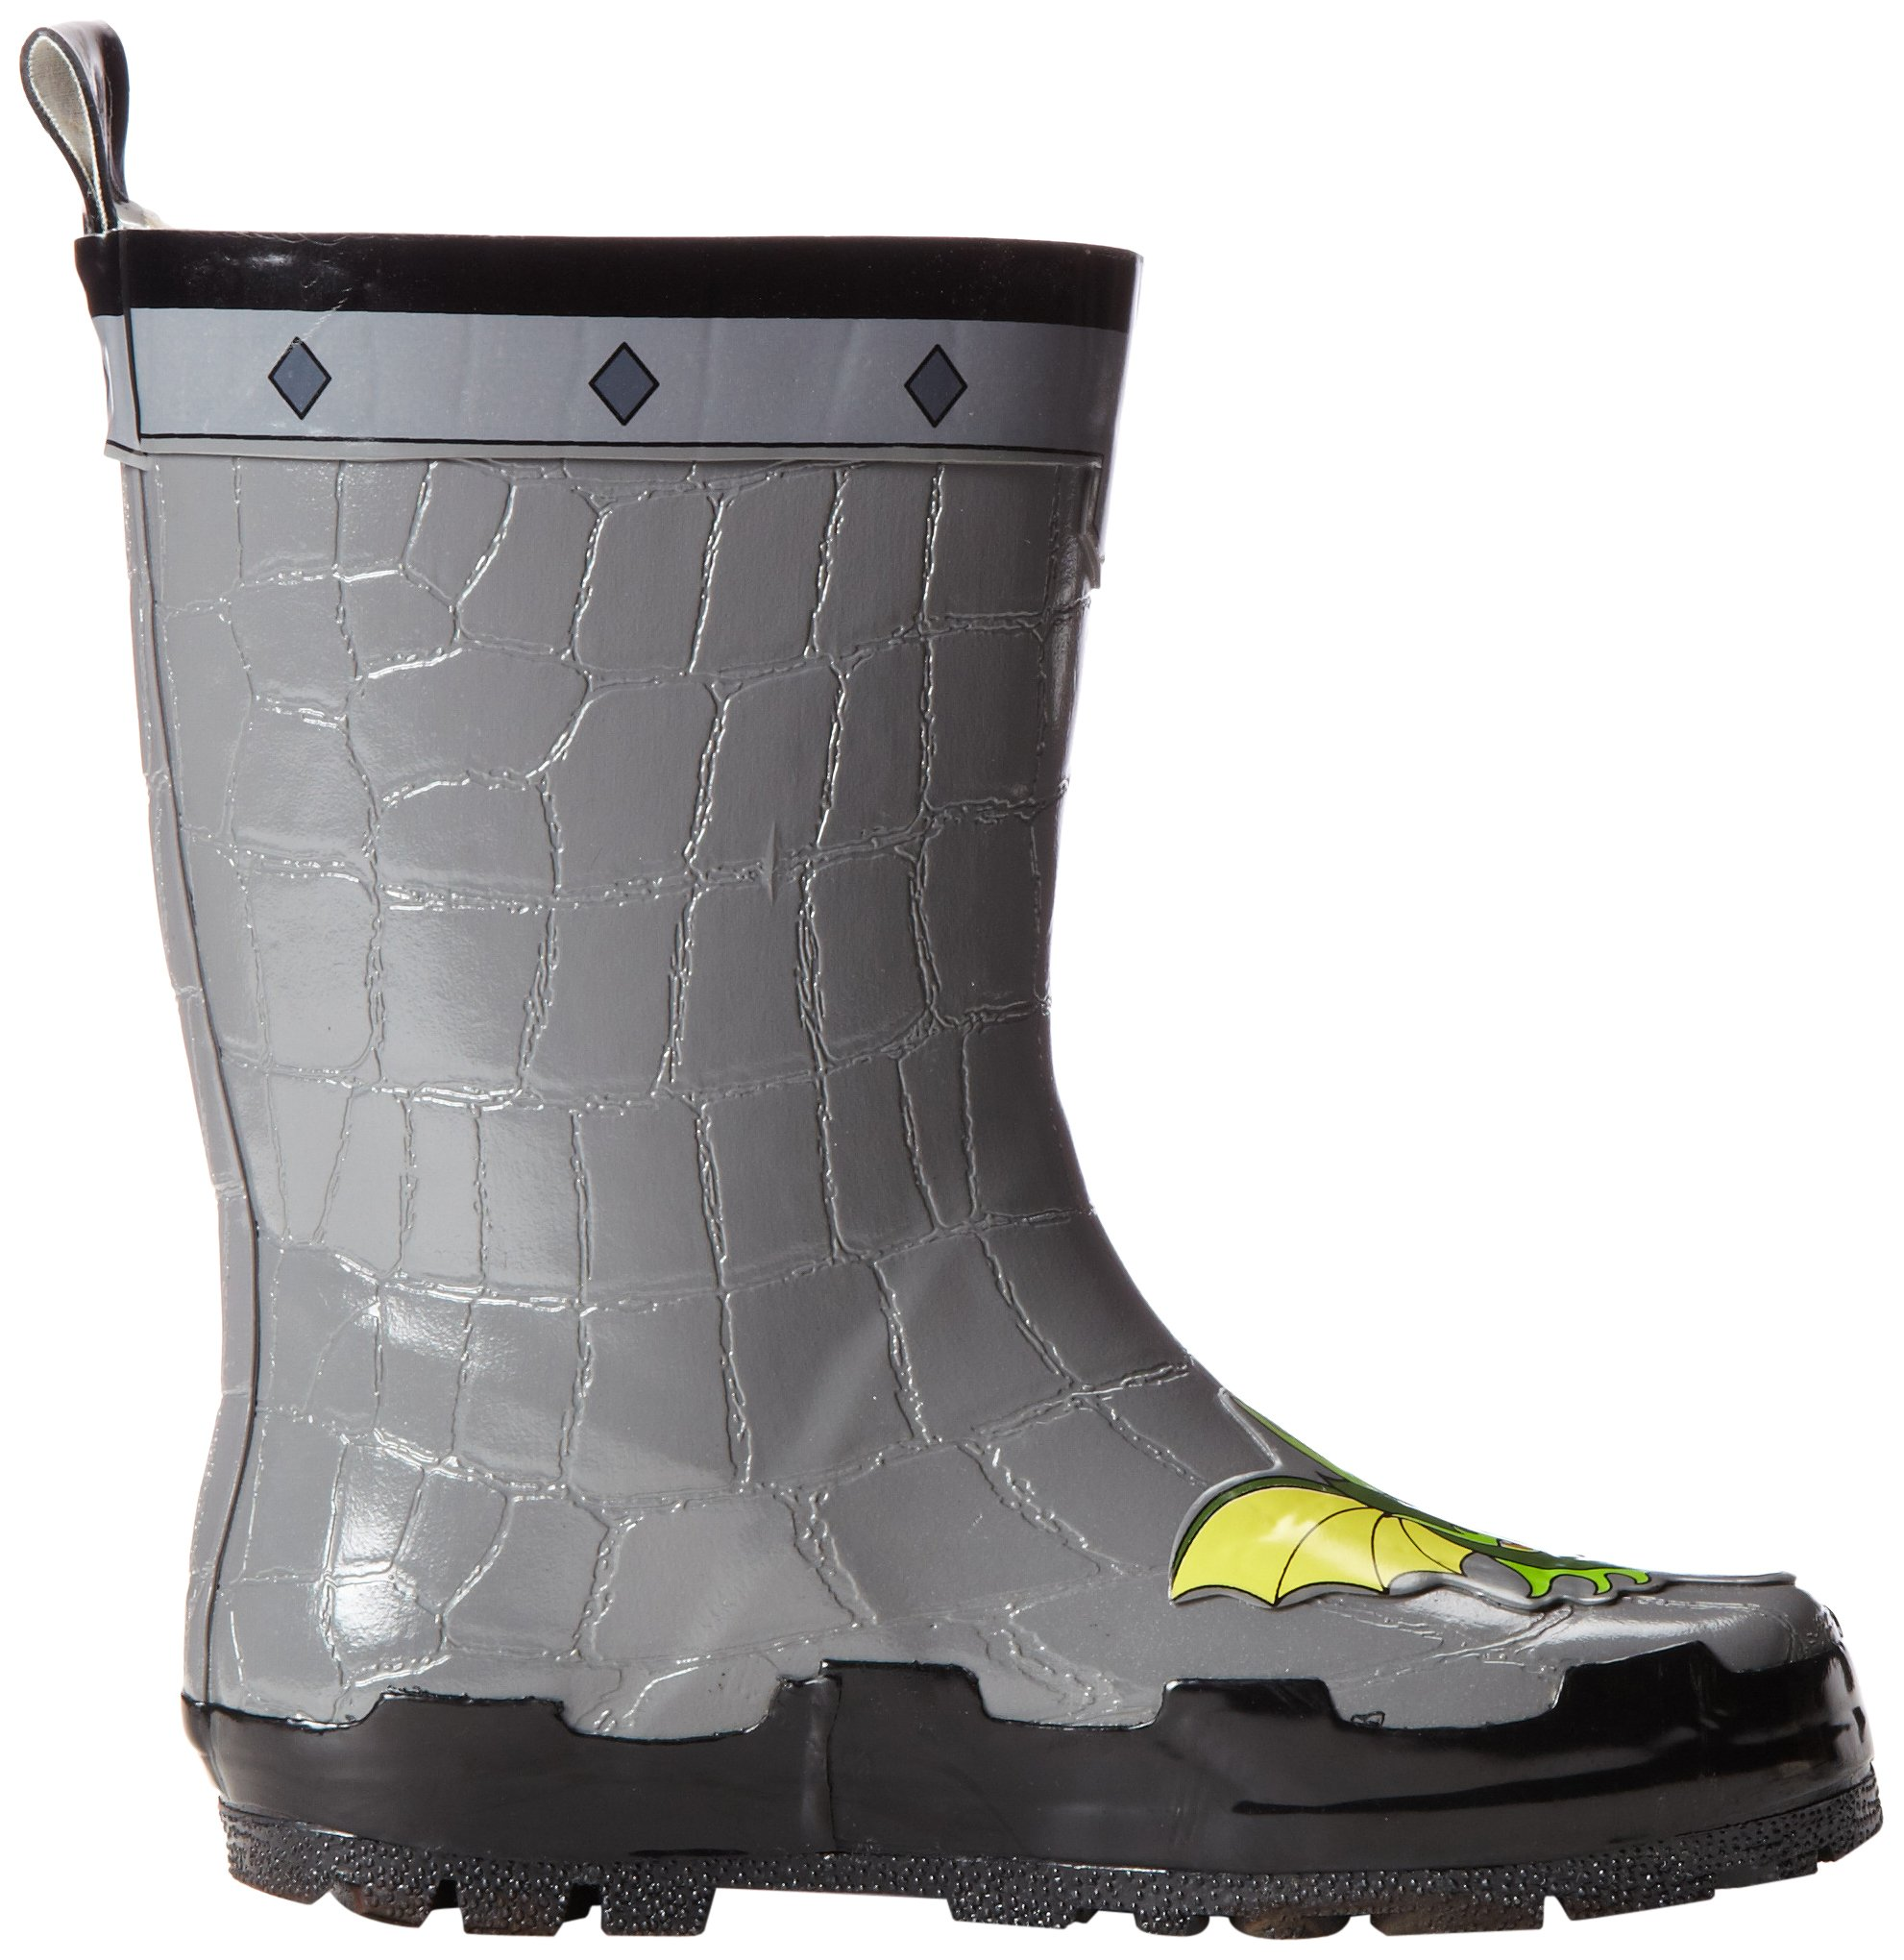 Kidorable Boys' Dragon Knight Rain Boot, Grey, 2 (Young Adult Size)